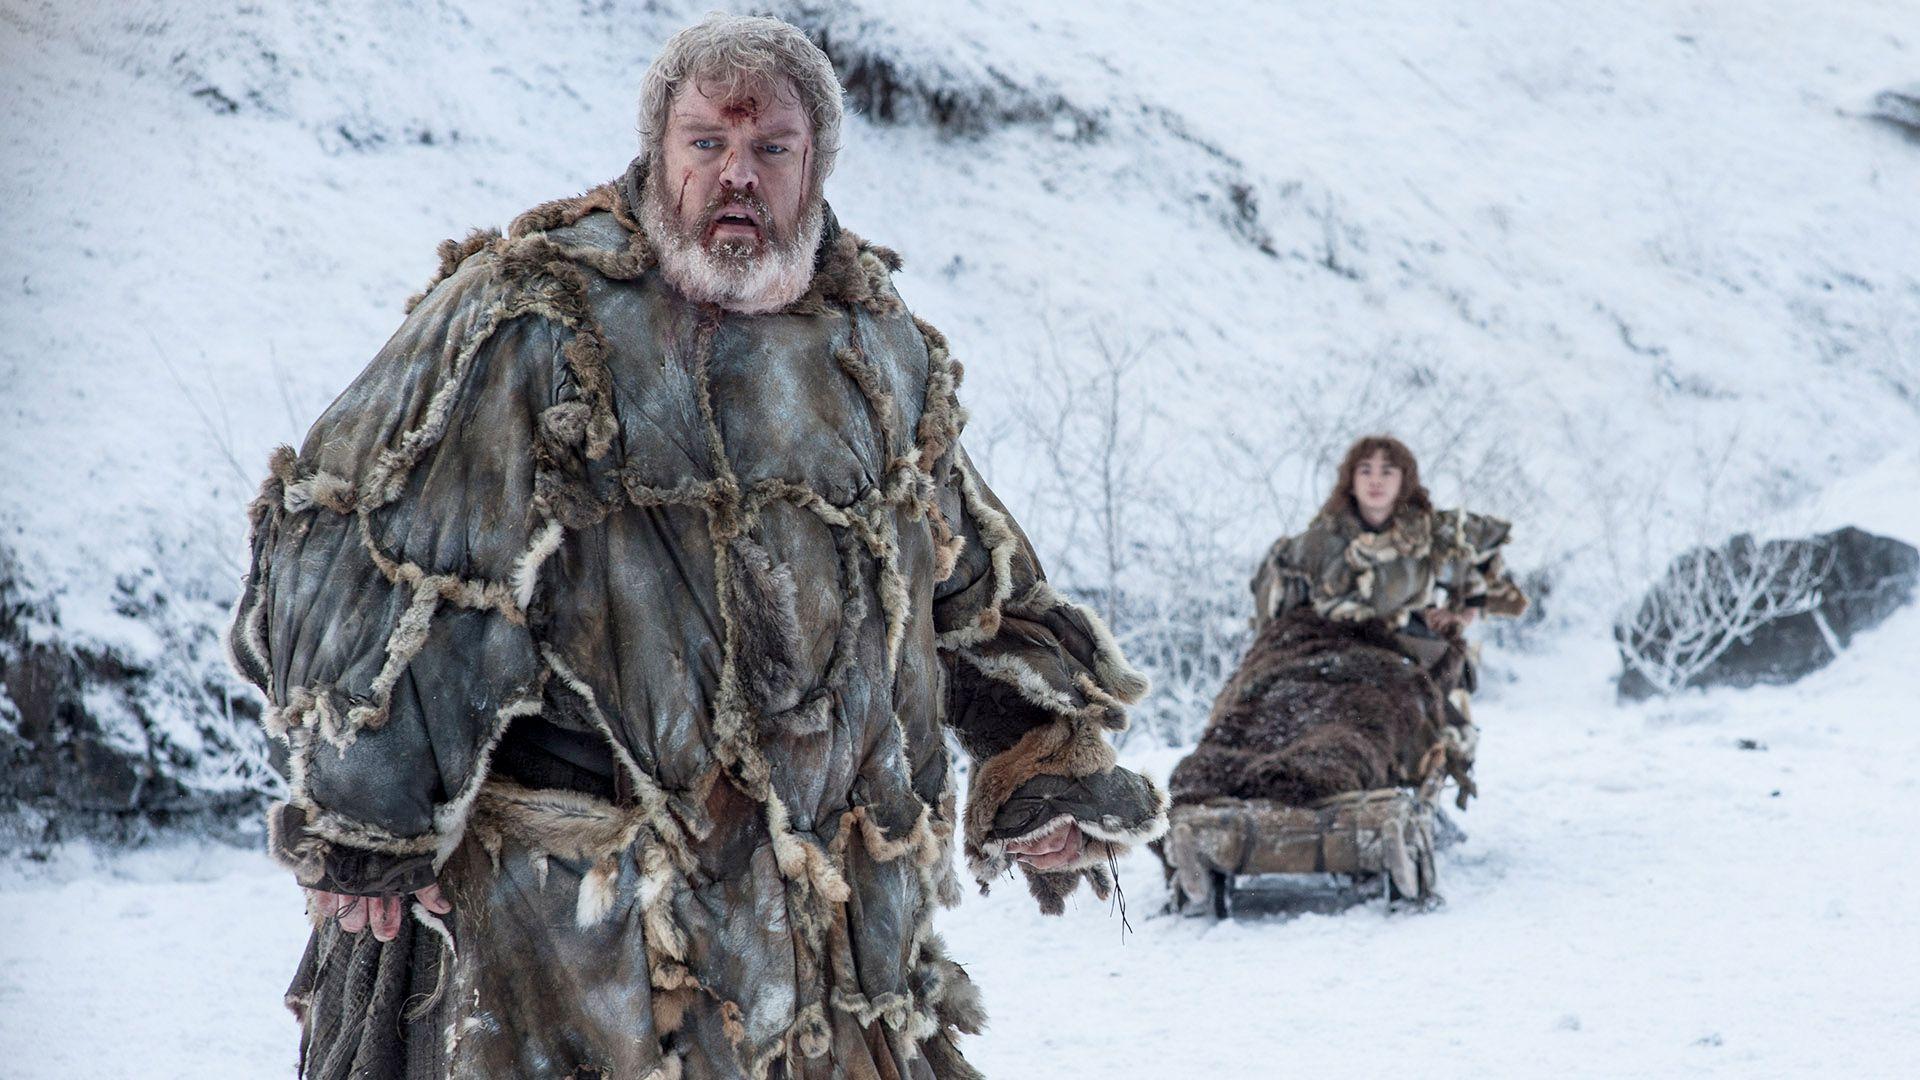 Game of Thrones, The Children